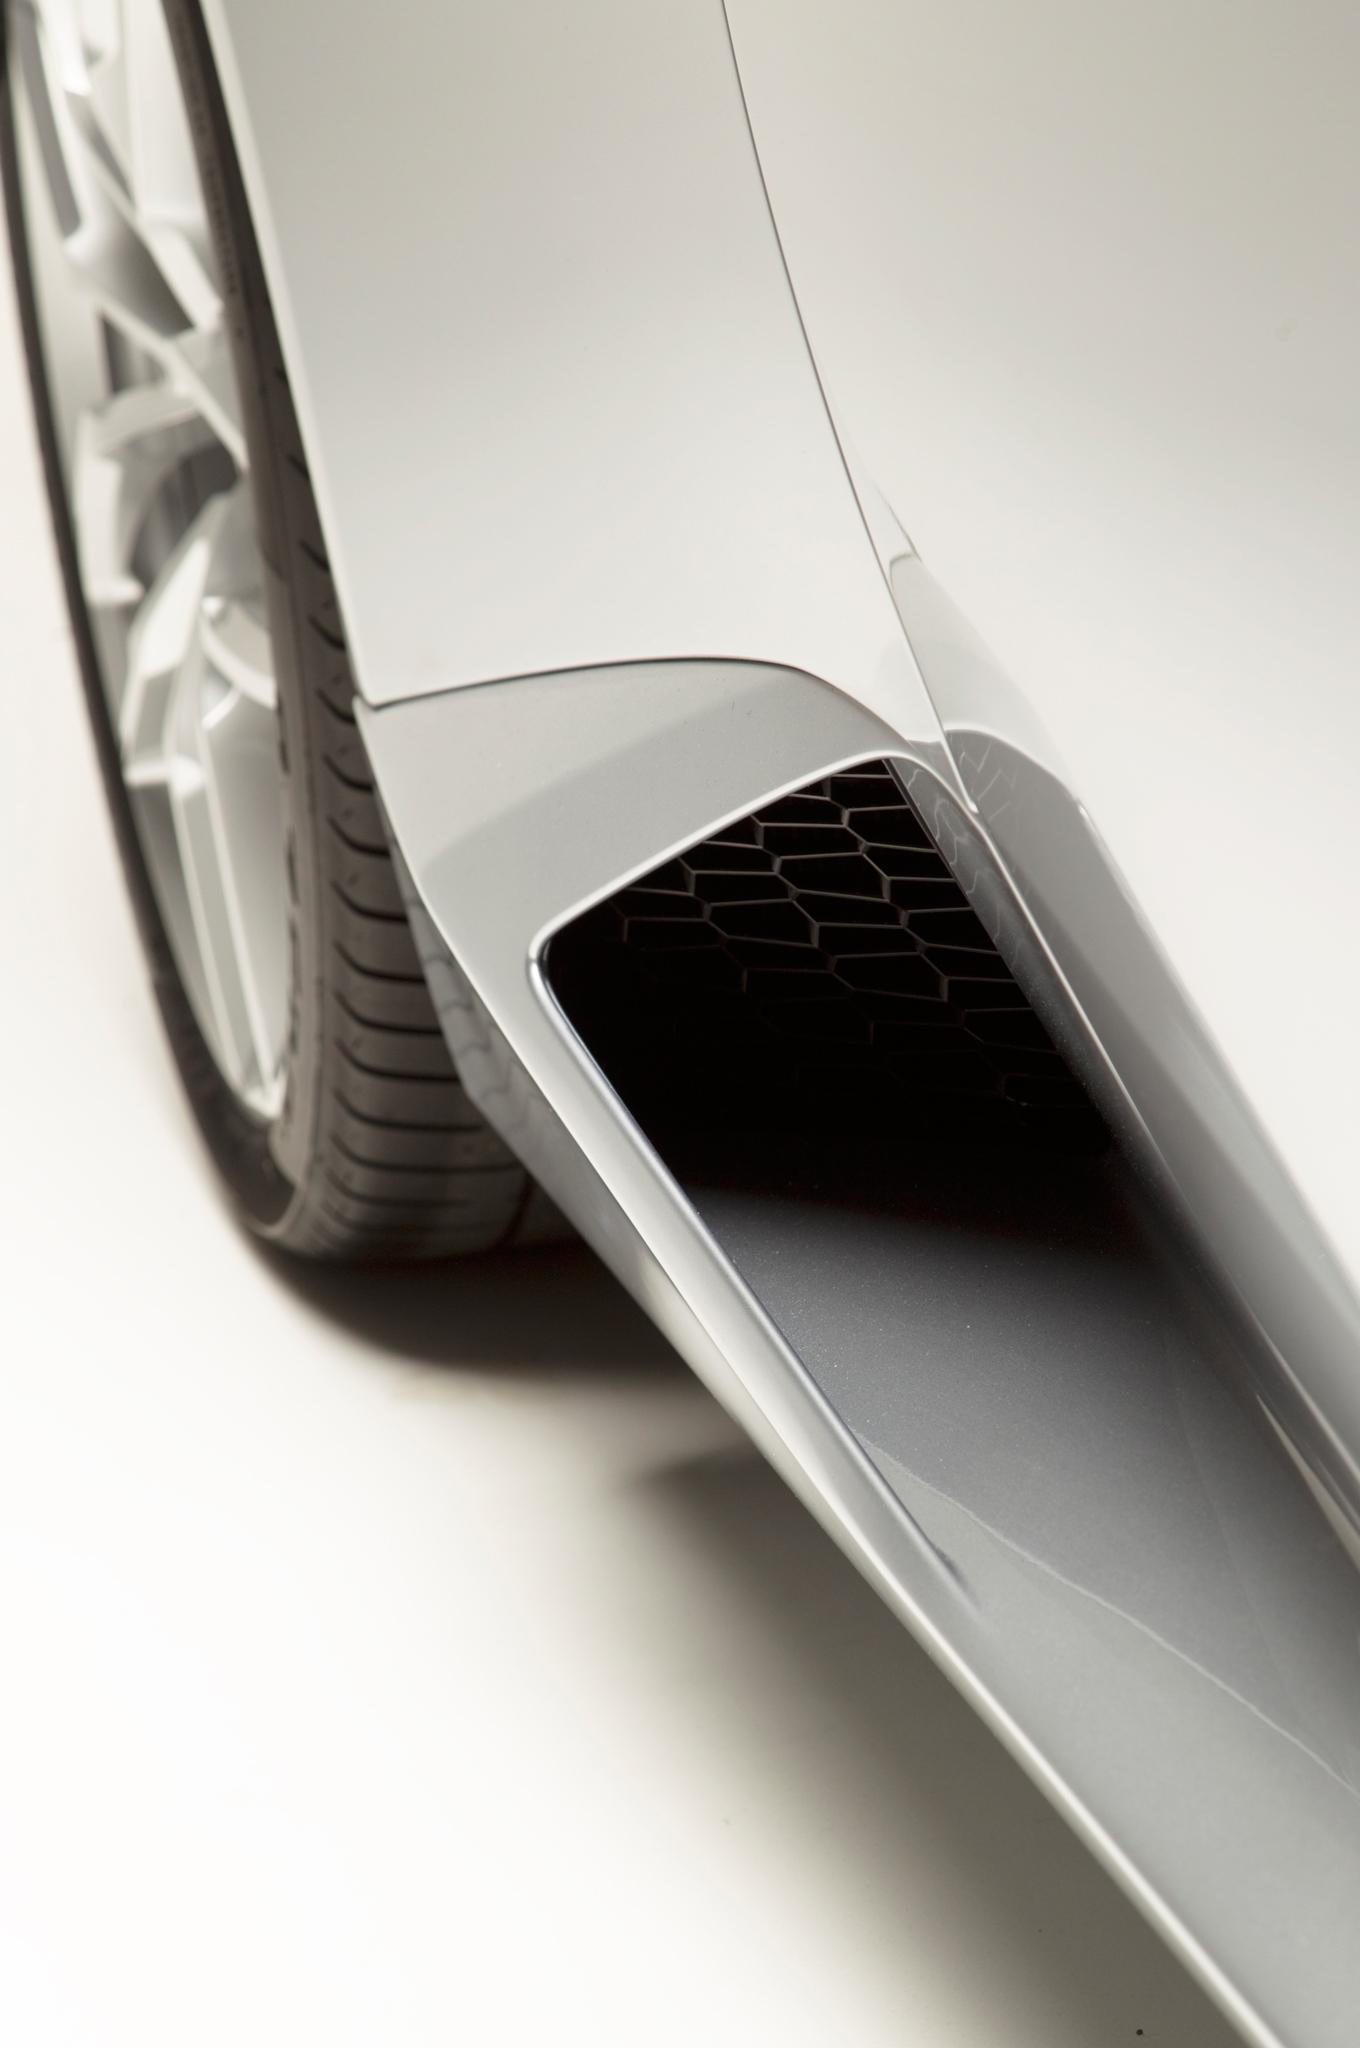 http—image.motortrend.com-f-roadtests-exotic-1312_2015_lamborghini_huracan_first_look-59412215-2015-Lamborghini-Huracan-vents